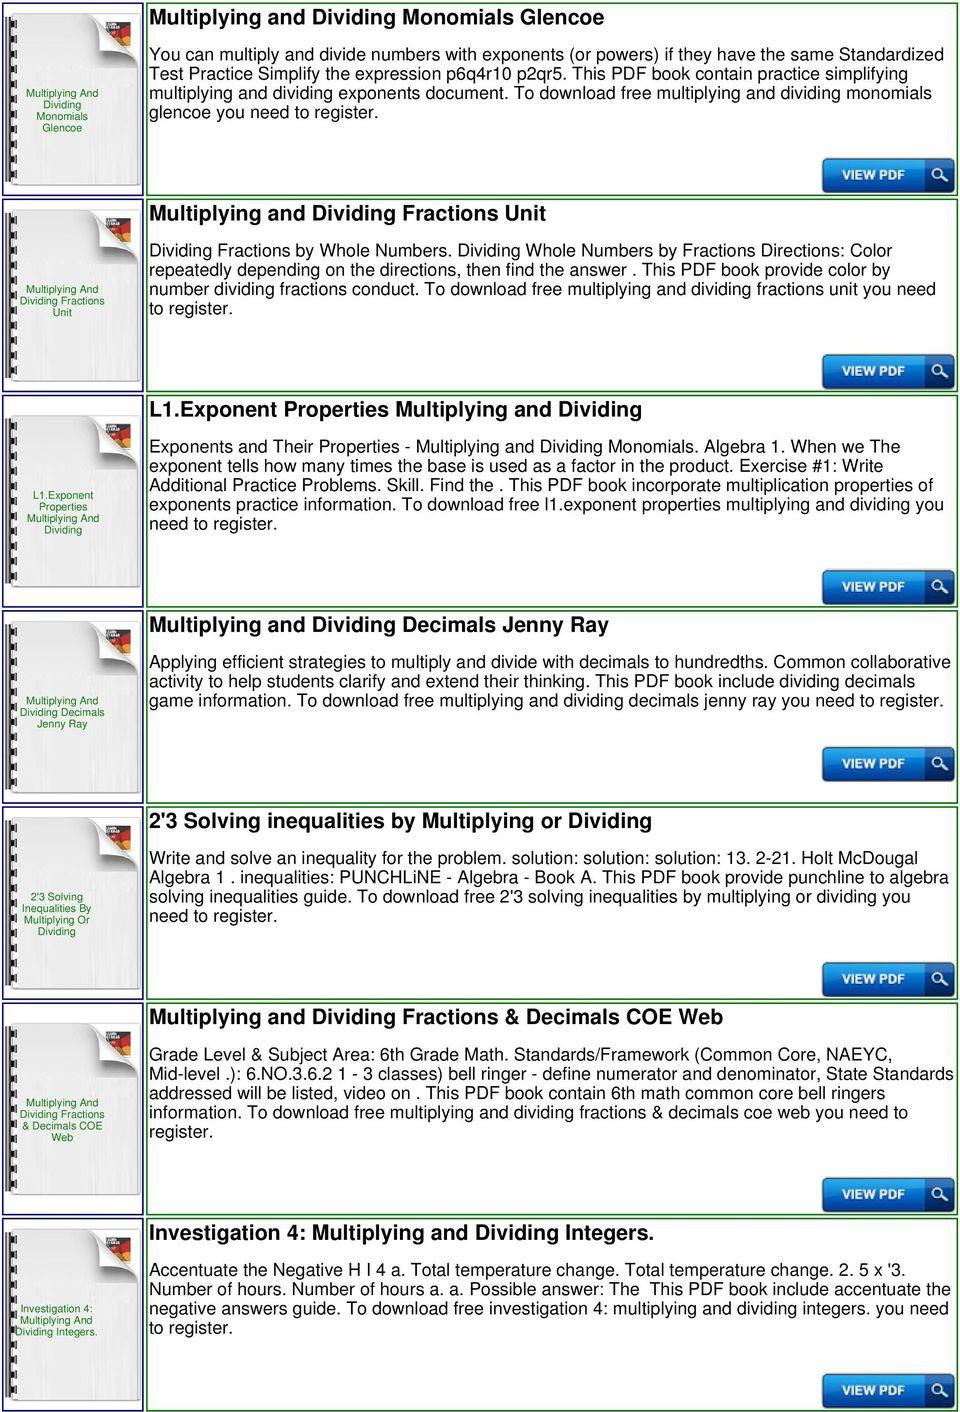 Simplifying Radicals Worksheet Pdf Practice Simplifying Multiplying and Dividing Exponents